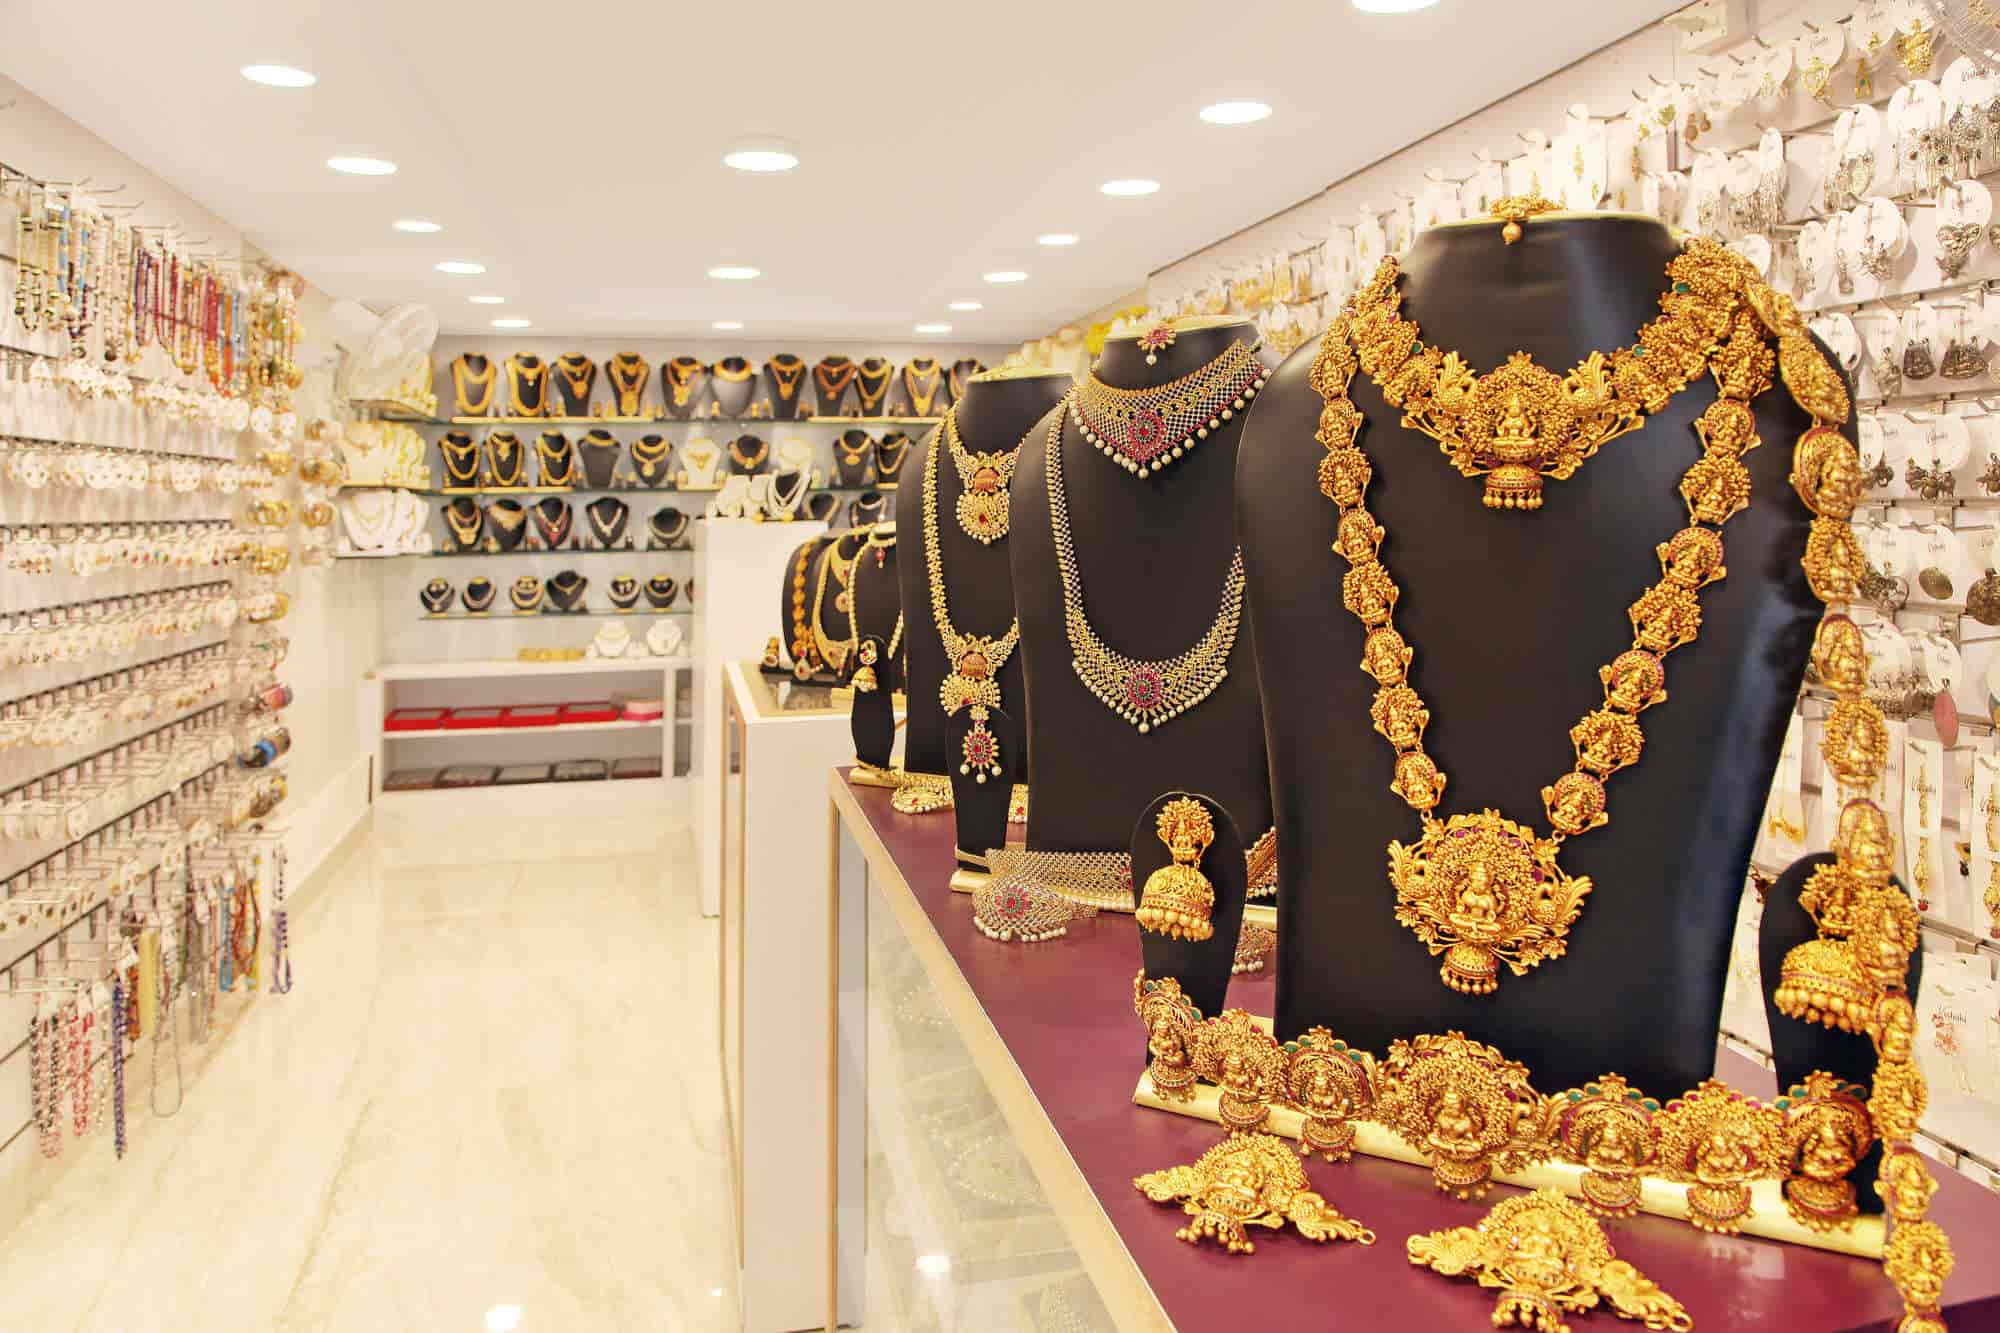 Top 20 Imitation Jewellery Showrooms In Mnk Road Best Imitation Jewelry Showrooms Bangalore Justdial